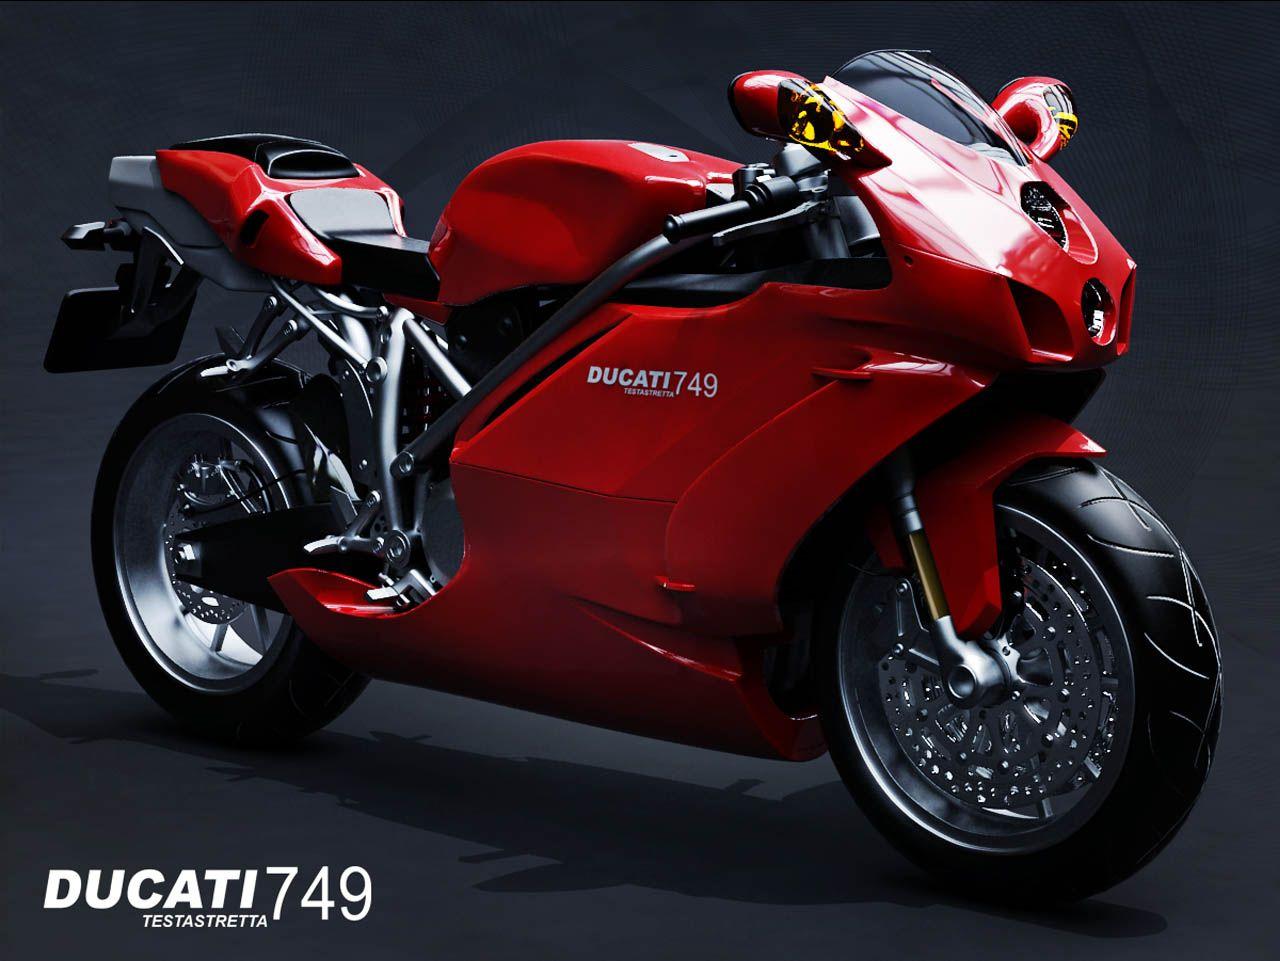 ducati749 03 servis manual free owners manual u2022 rh wordworksbysea com ducati 749s service manual Ducati 748